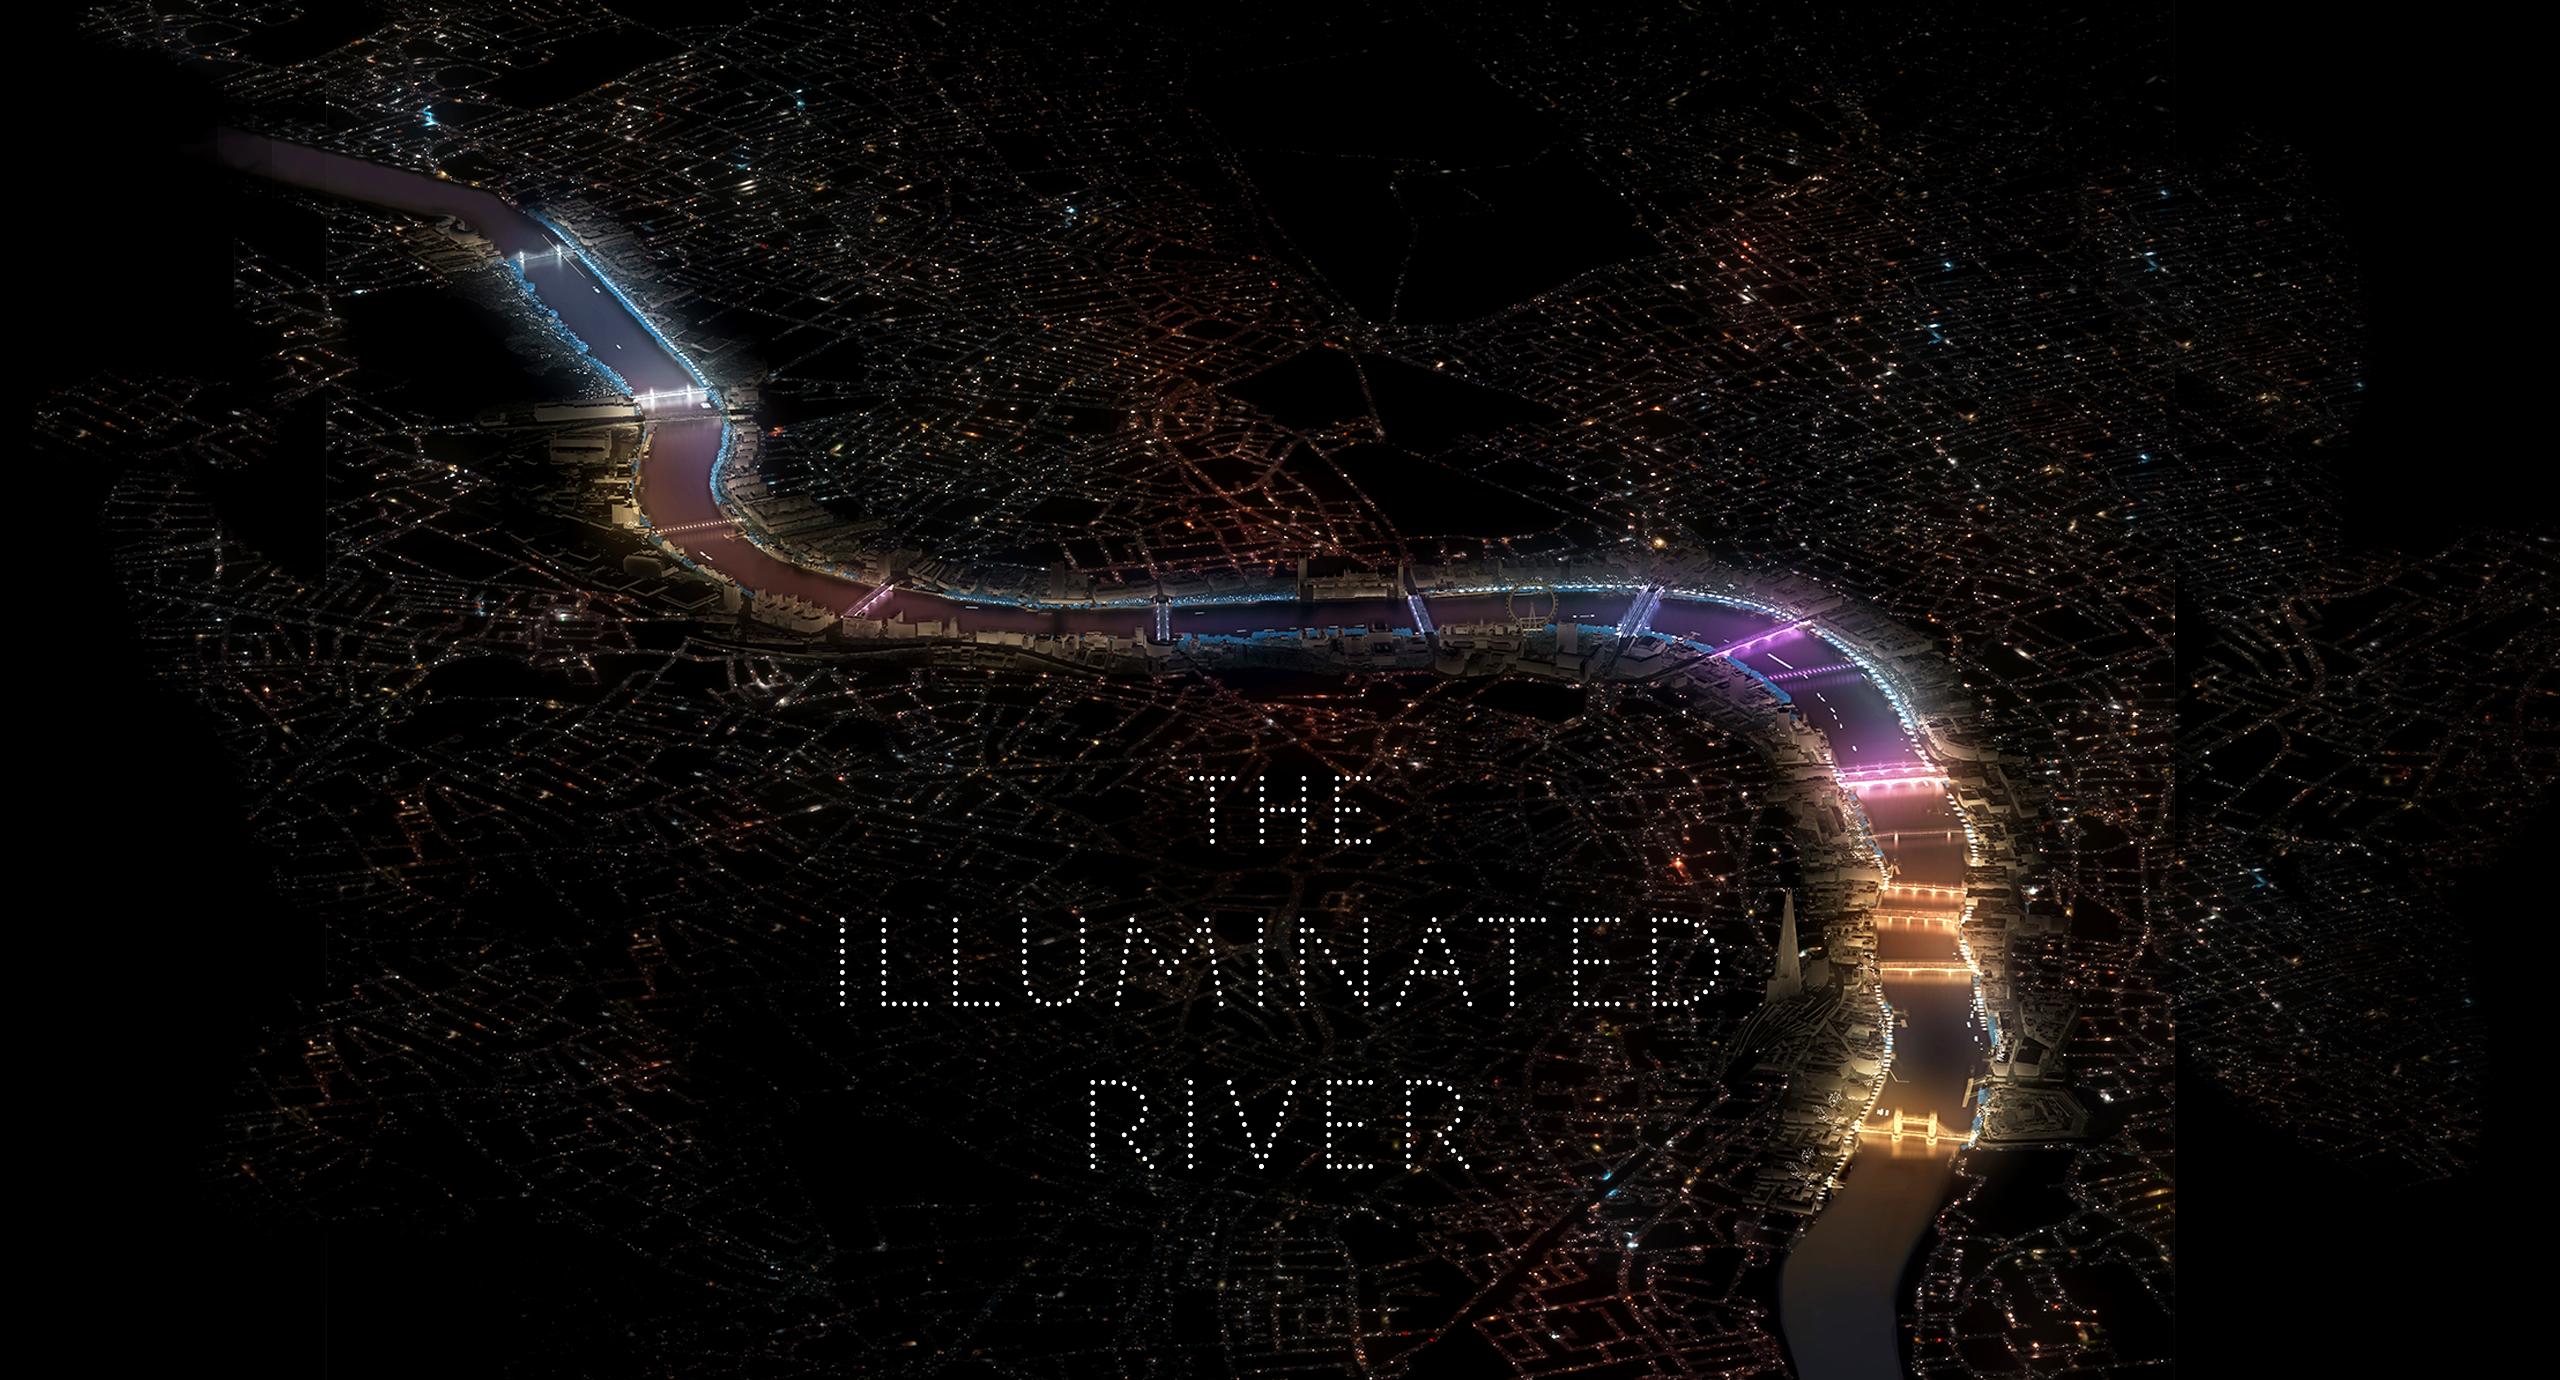 Baxter & Bailey - The Illuminated River